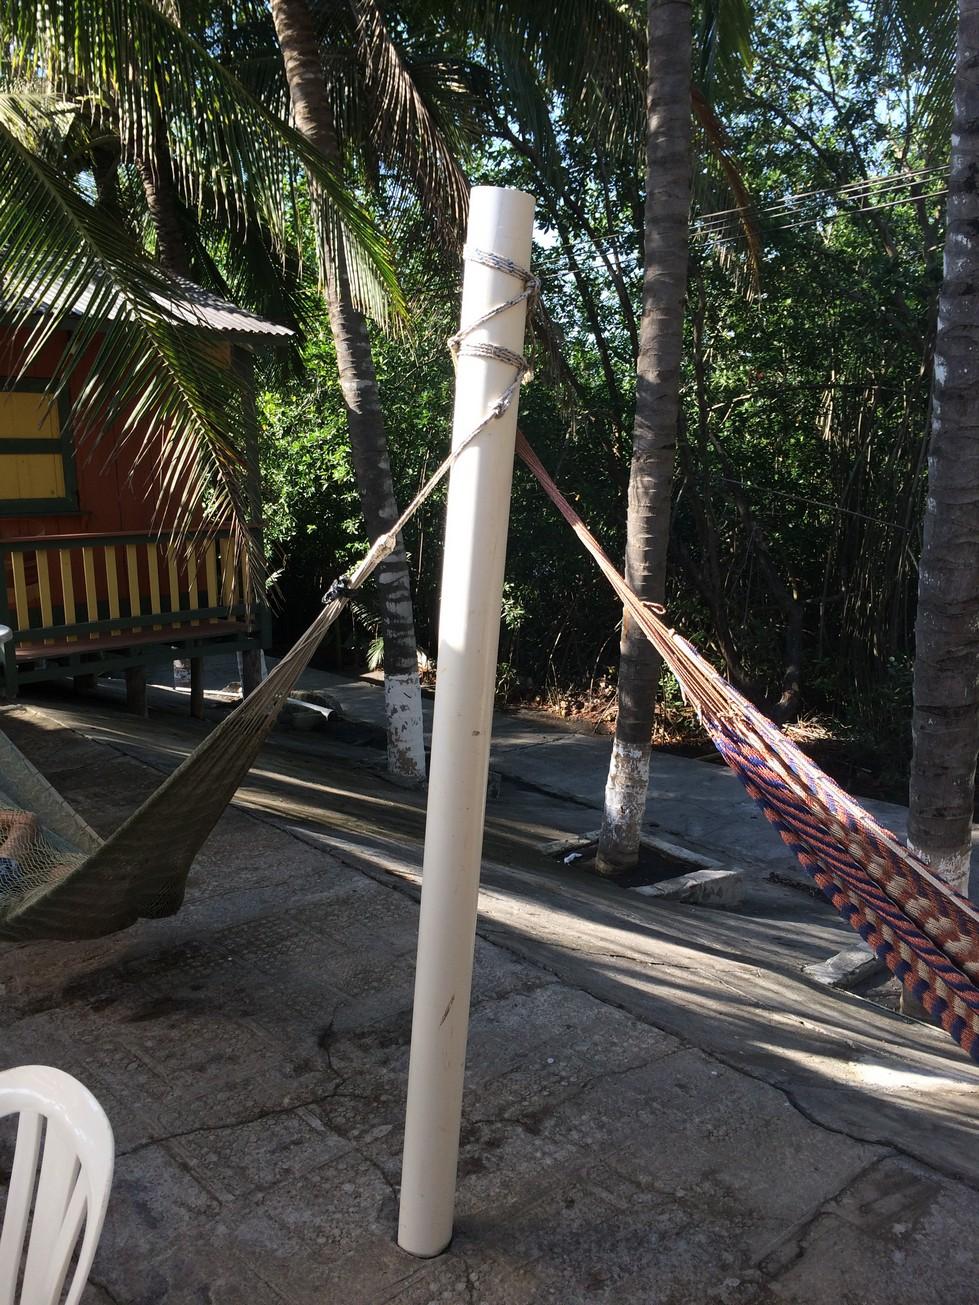 The poles holding up the hammocks (PVC).